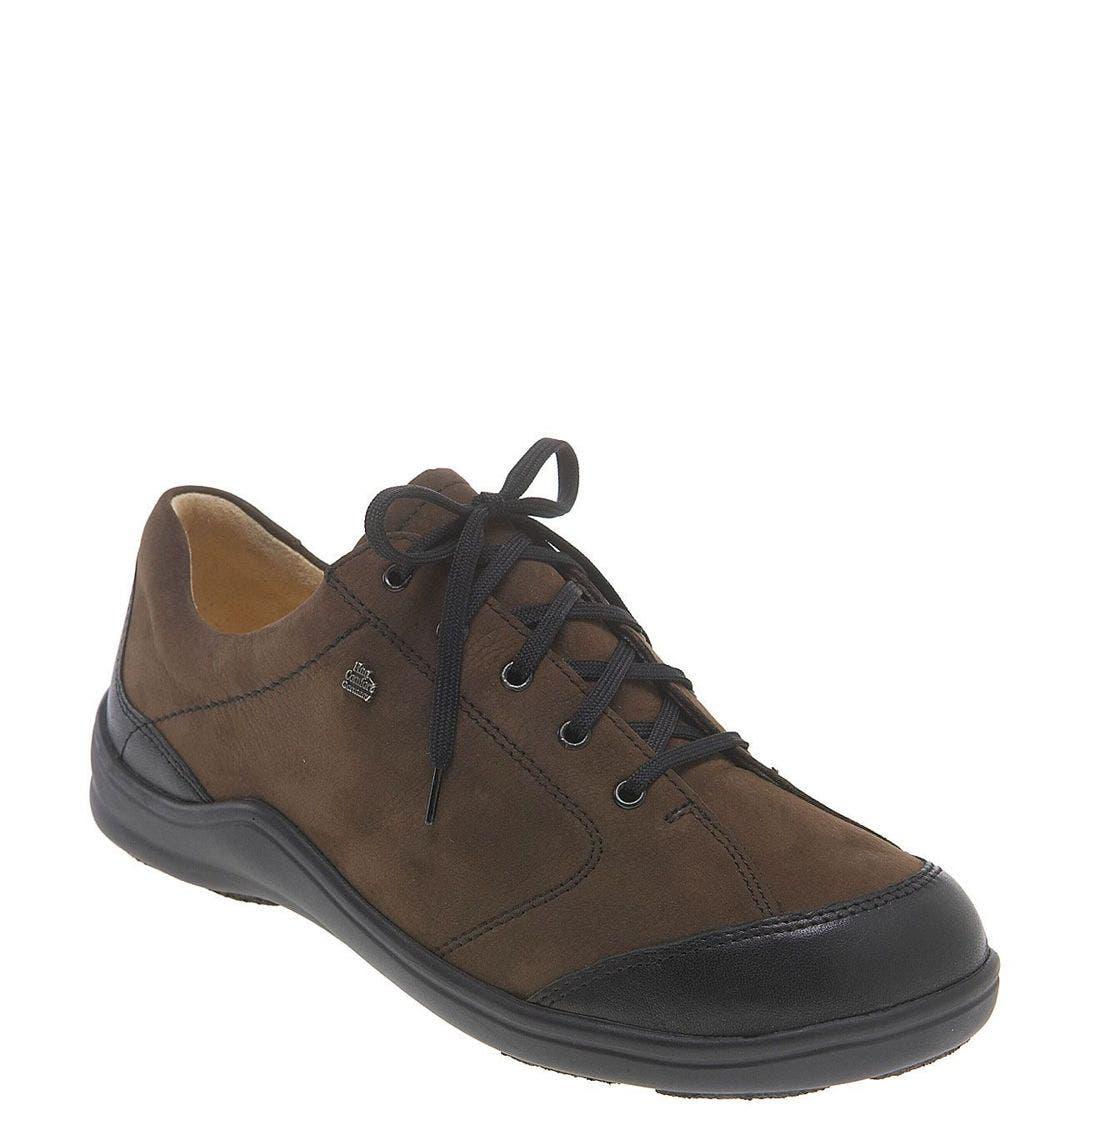 Main Image - Finn Comfort 'Cusco' Sneaker